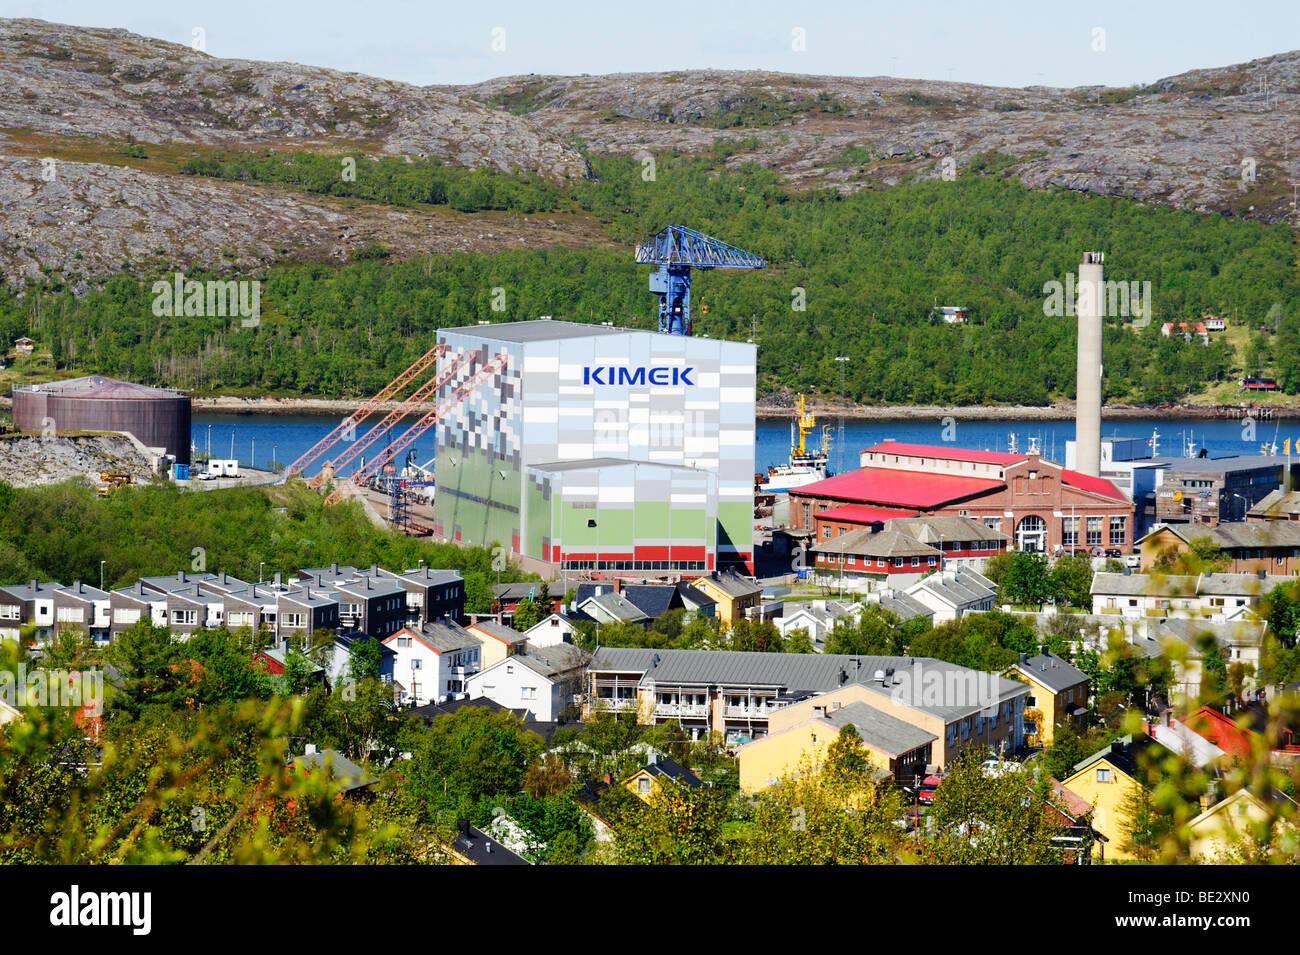 Kimek dockyard facilities, Kirkenes, Norway, Scandinavia, Europe - Stock Image